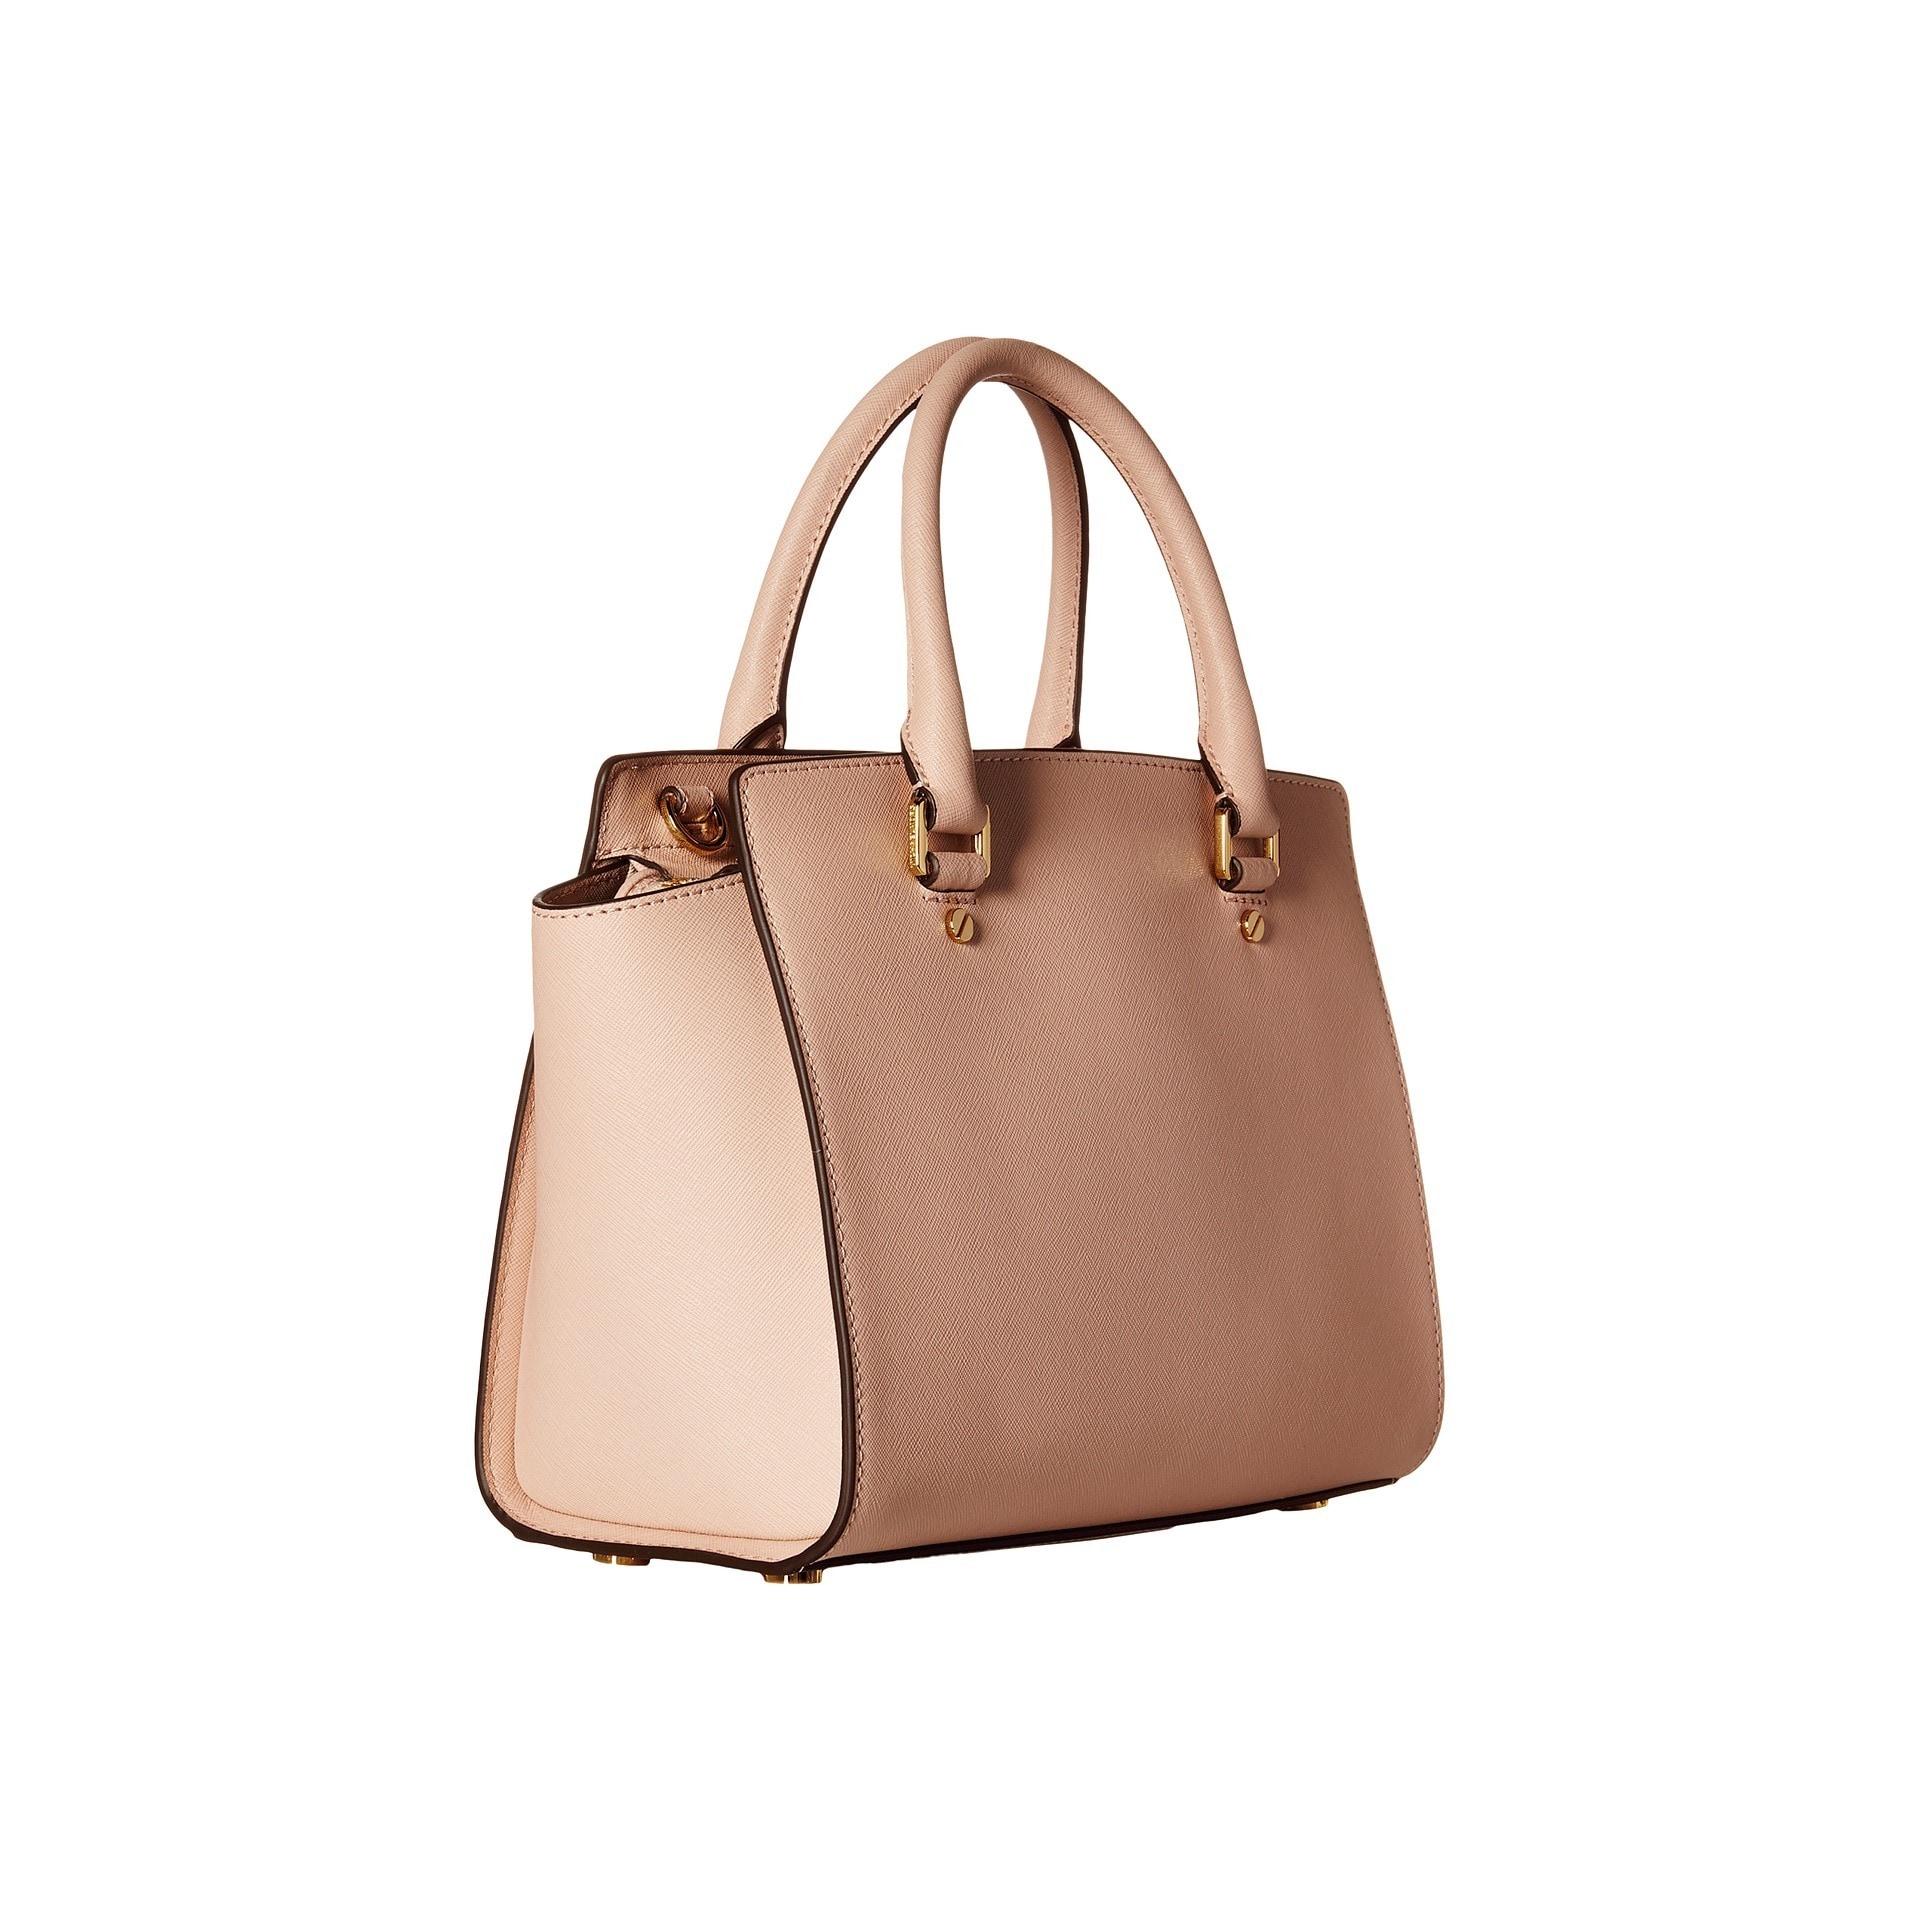 c93d083b5939 Shop Michael Kors Selma Medium Ballet Satchel Handbag - Free Shipping Today  - Overstock - 11098779